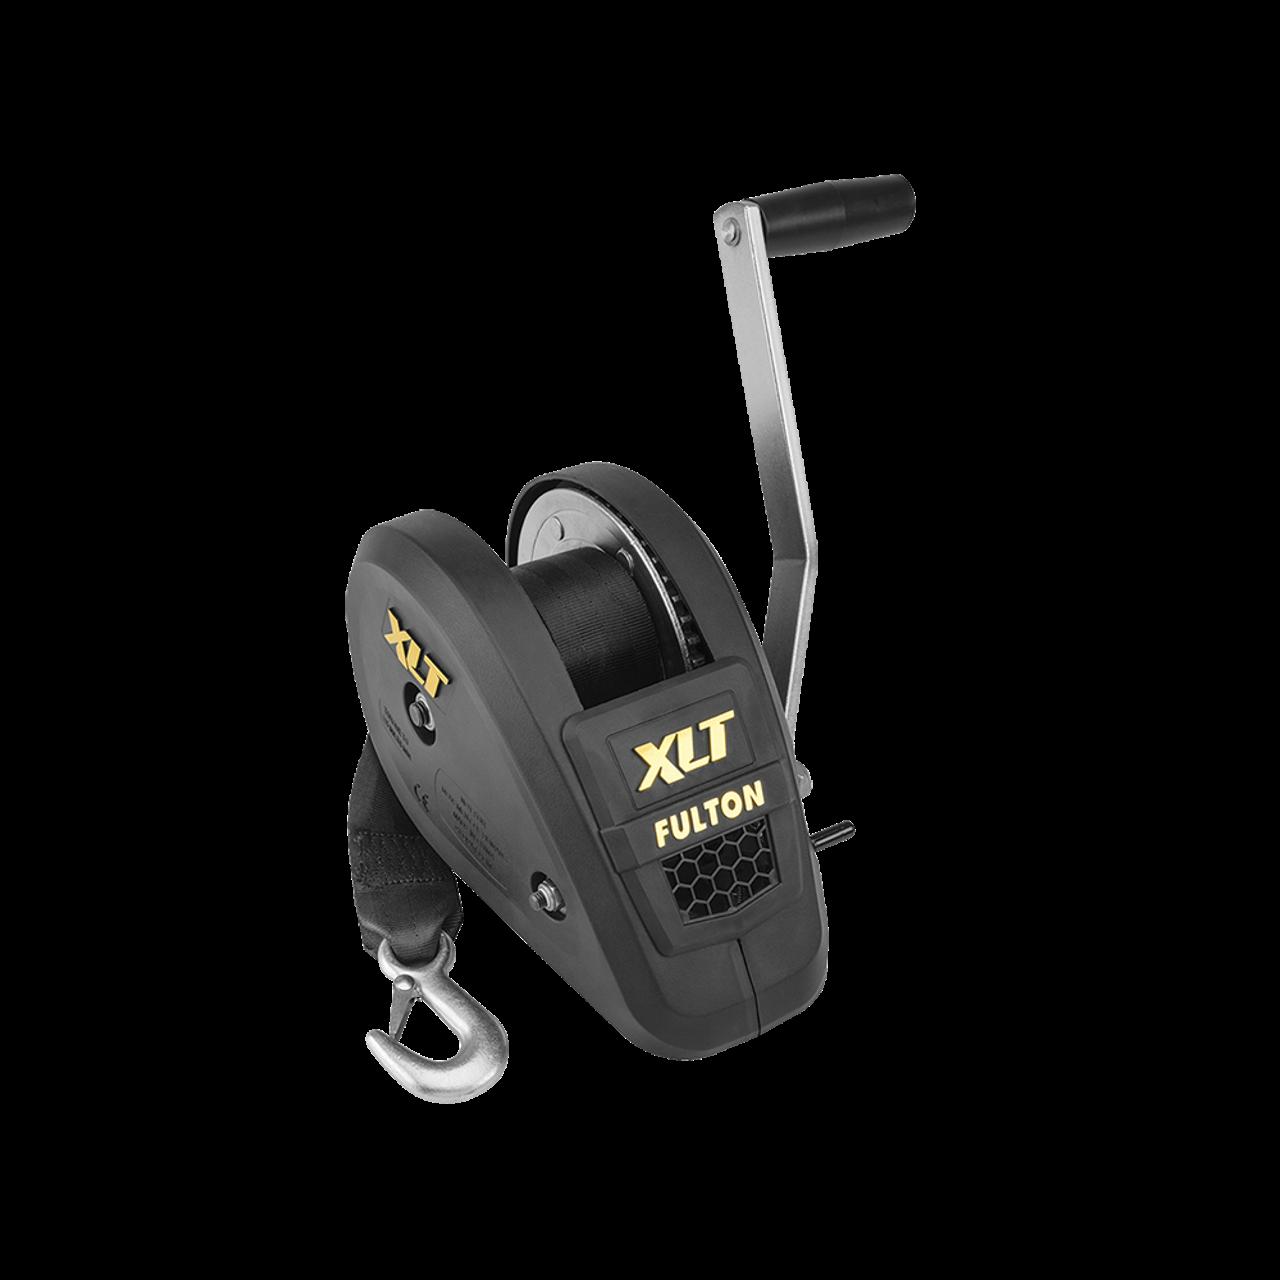 142314 --- Fulton Single Speed Trailer Winch - 1,800 lb Capacity